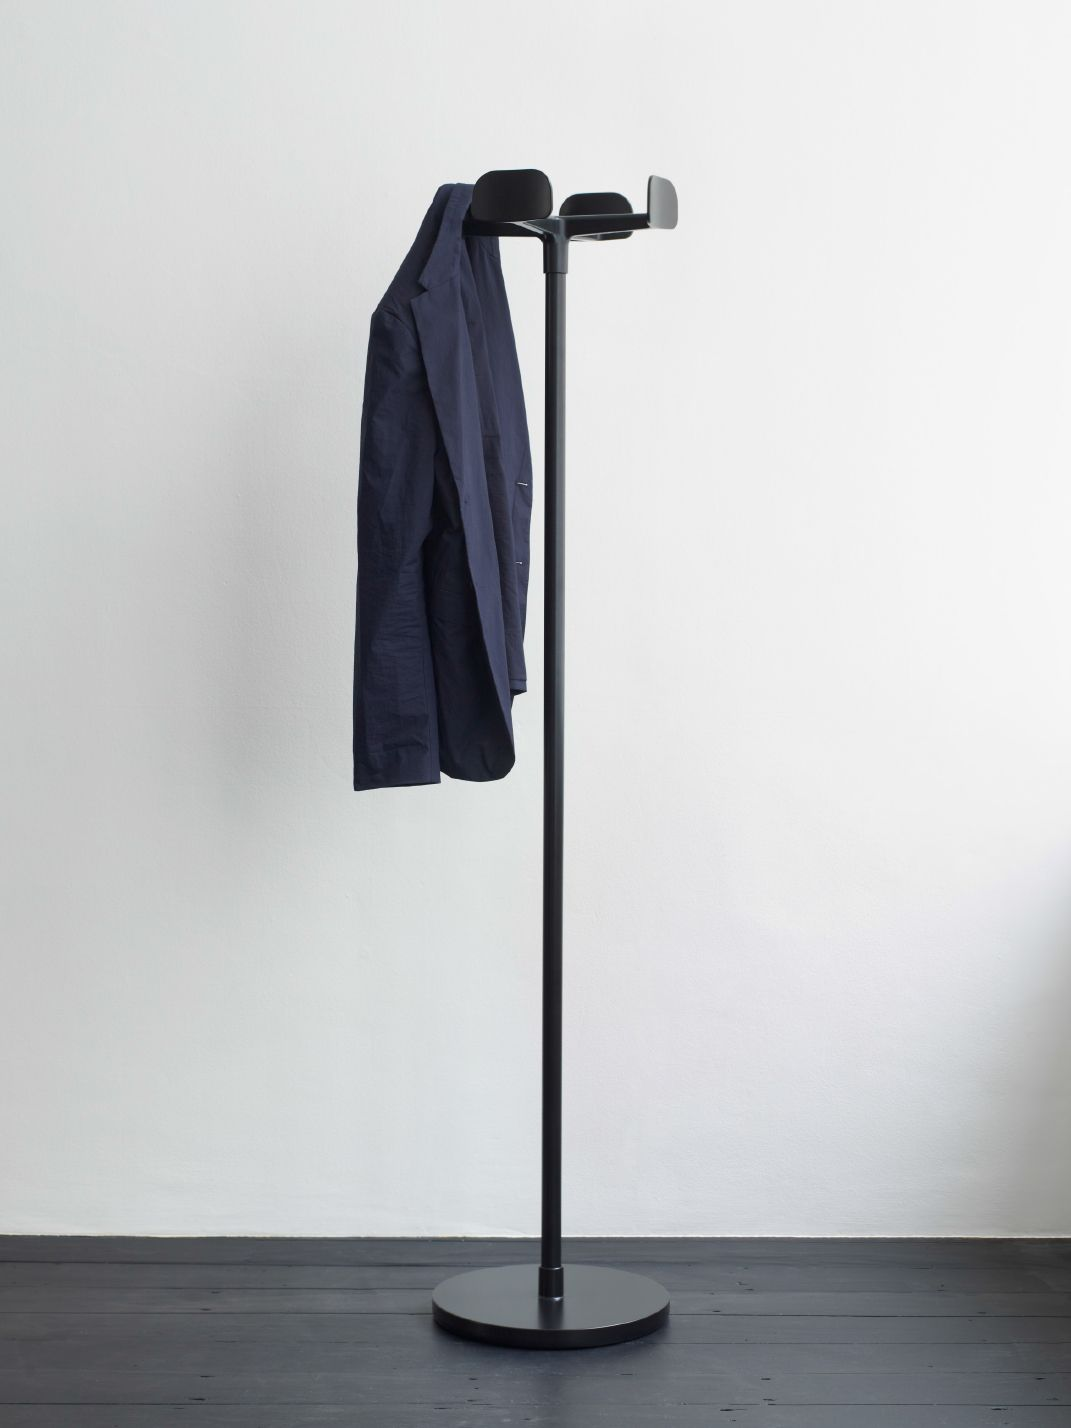 Four Leaves Iconic Furniture Design Coat Stands Umbrella Stand